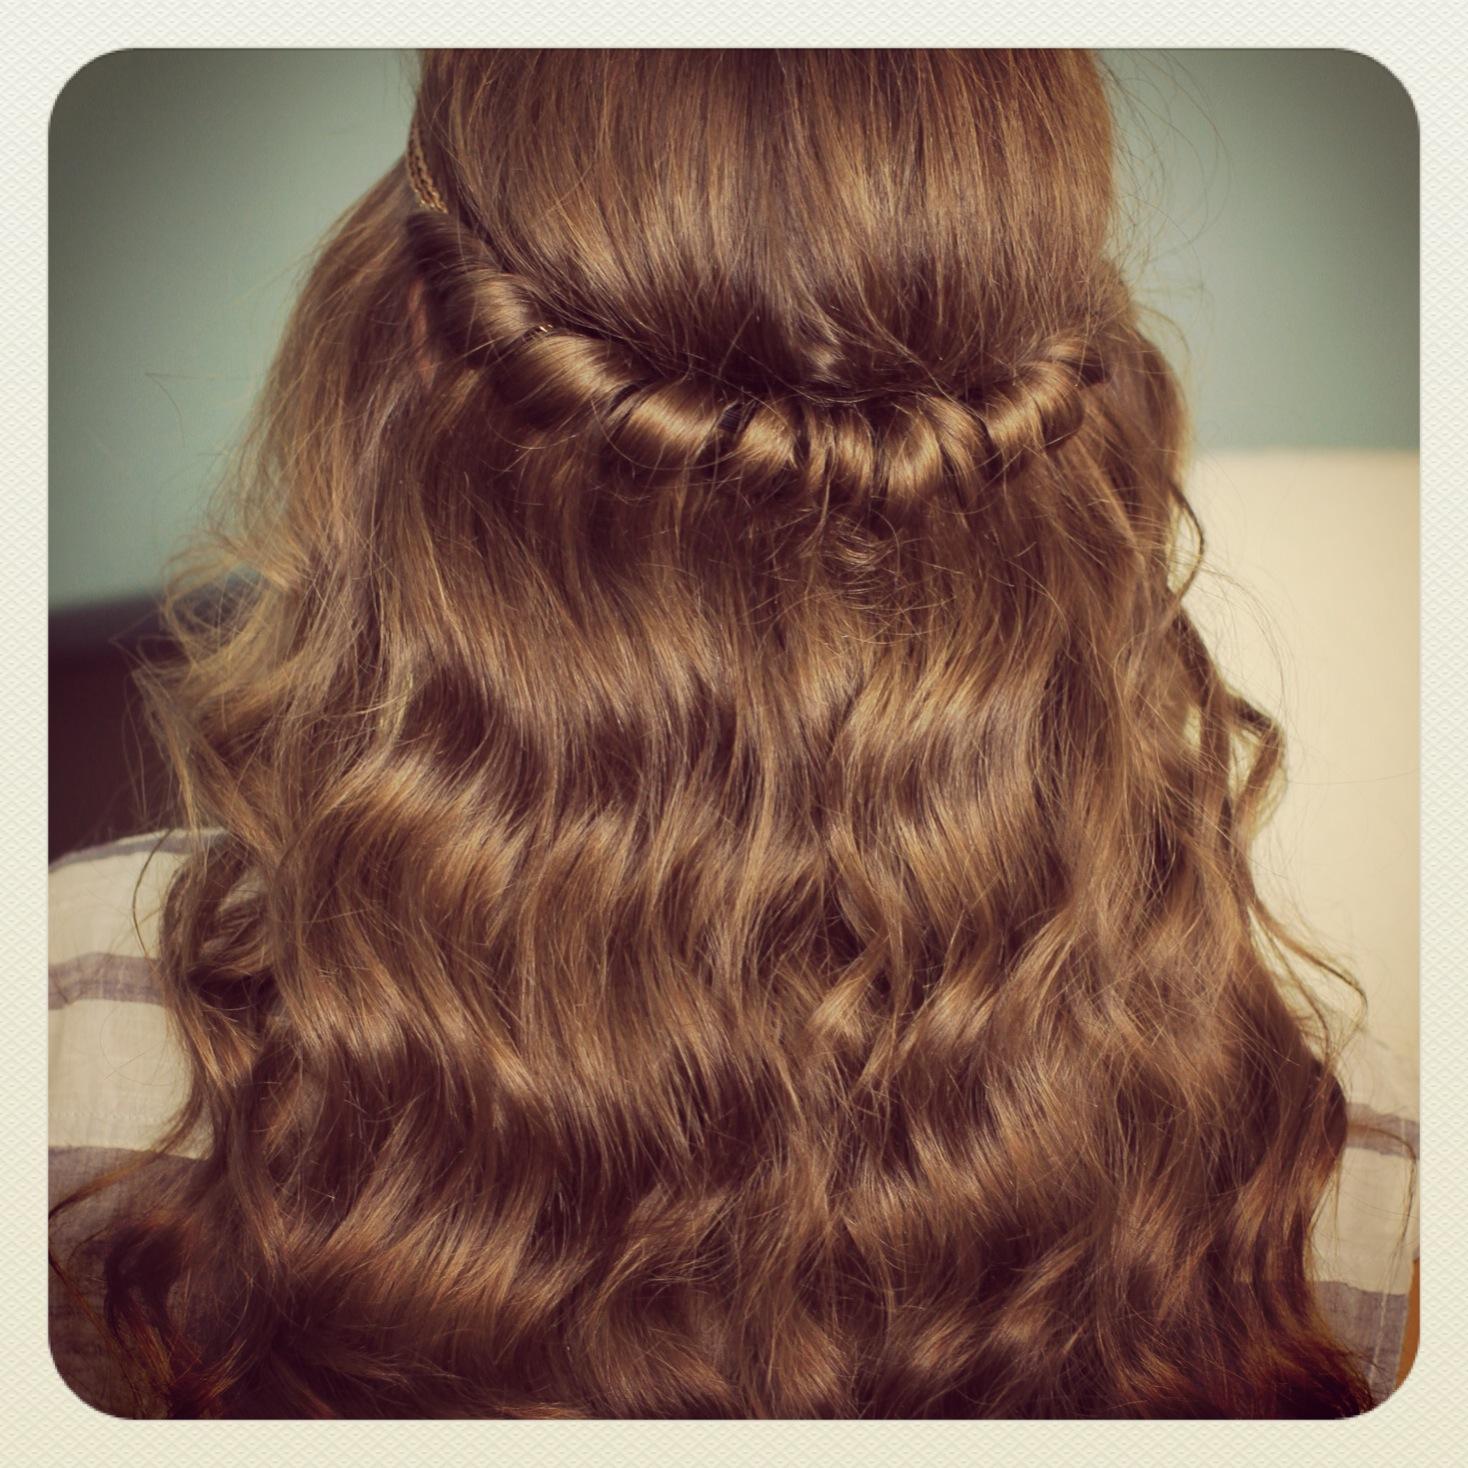 Crochet Hair Half Up Half Down : Headband Twist Half-Up Half Down Hairstyles ReflectionsReflections